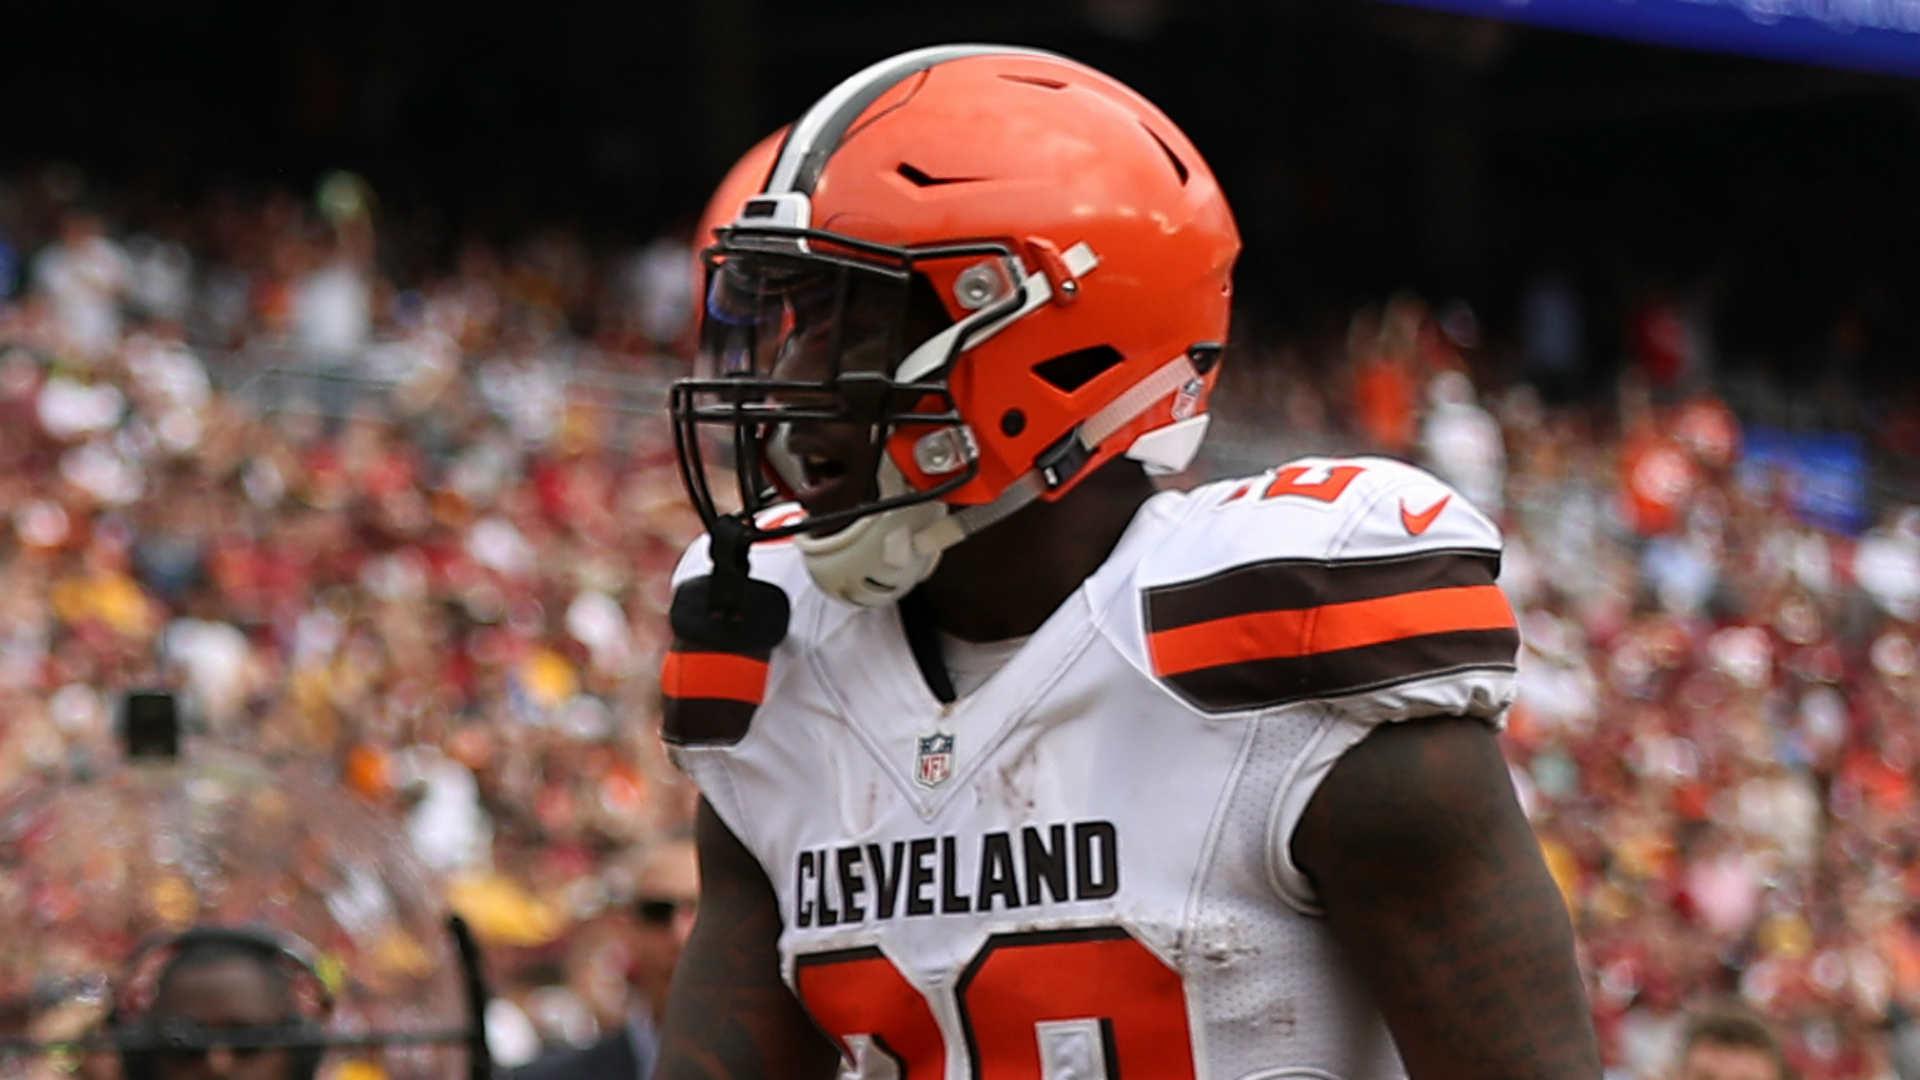 Browns trade disgruntled running back Duke Johnson to Texans